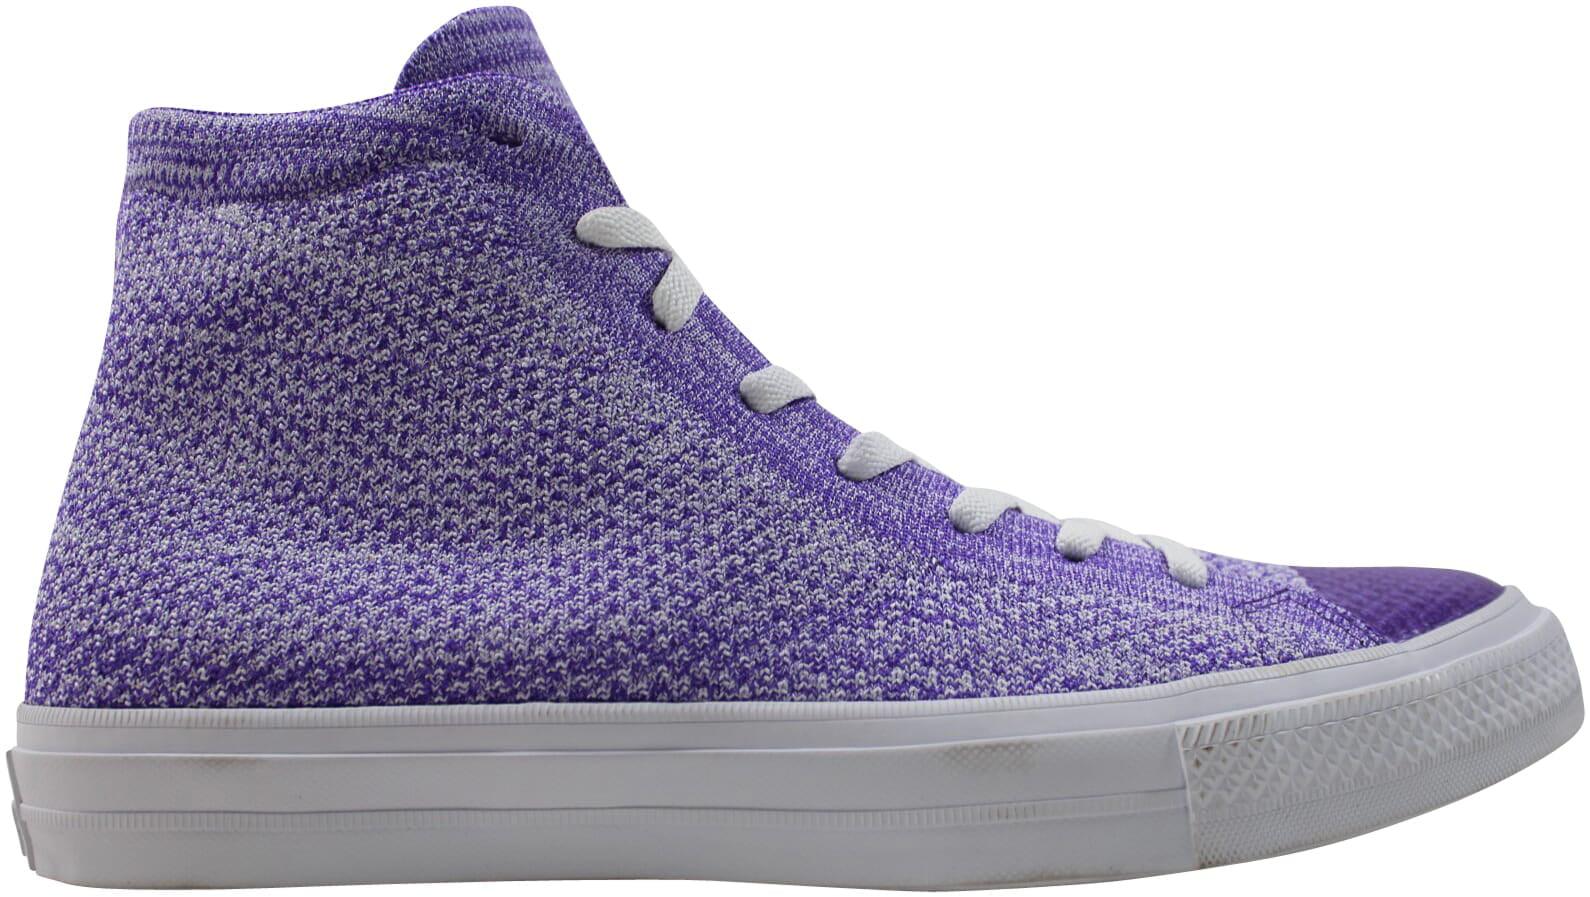 Converse Chuck Taylor hi Purple/White